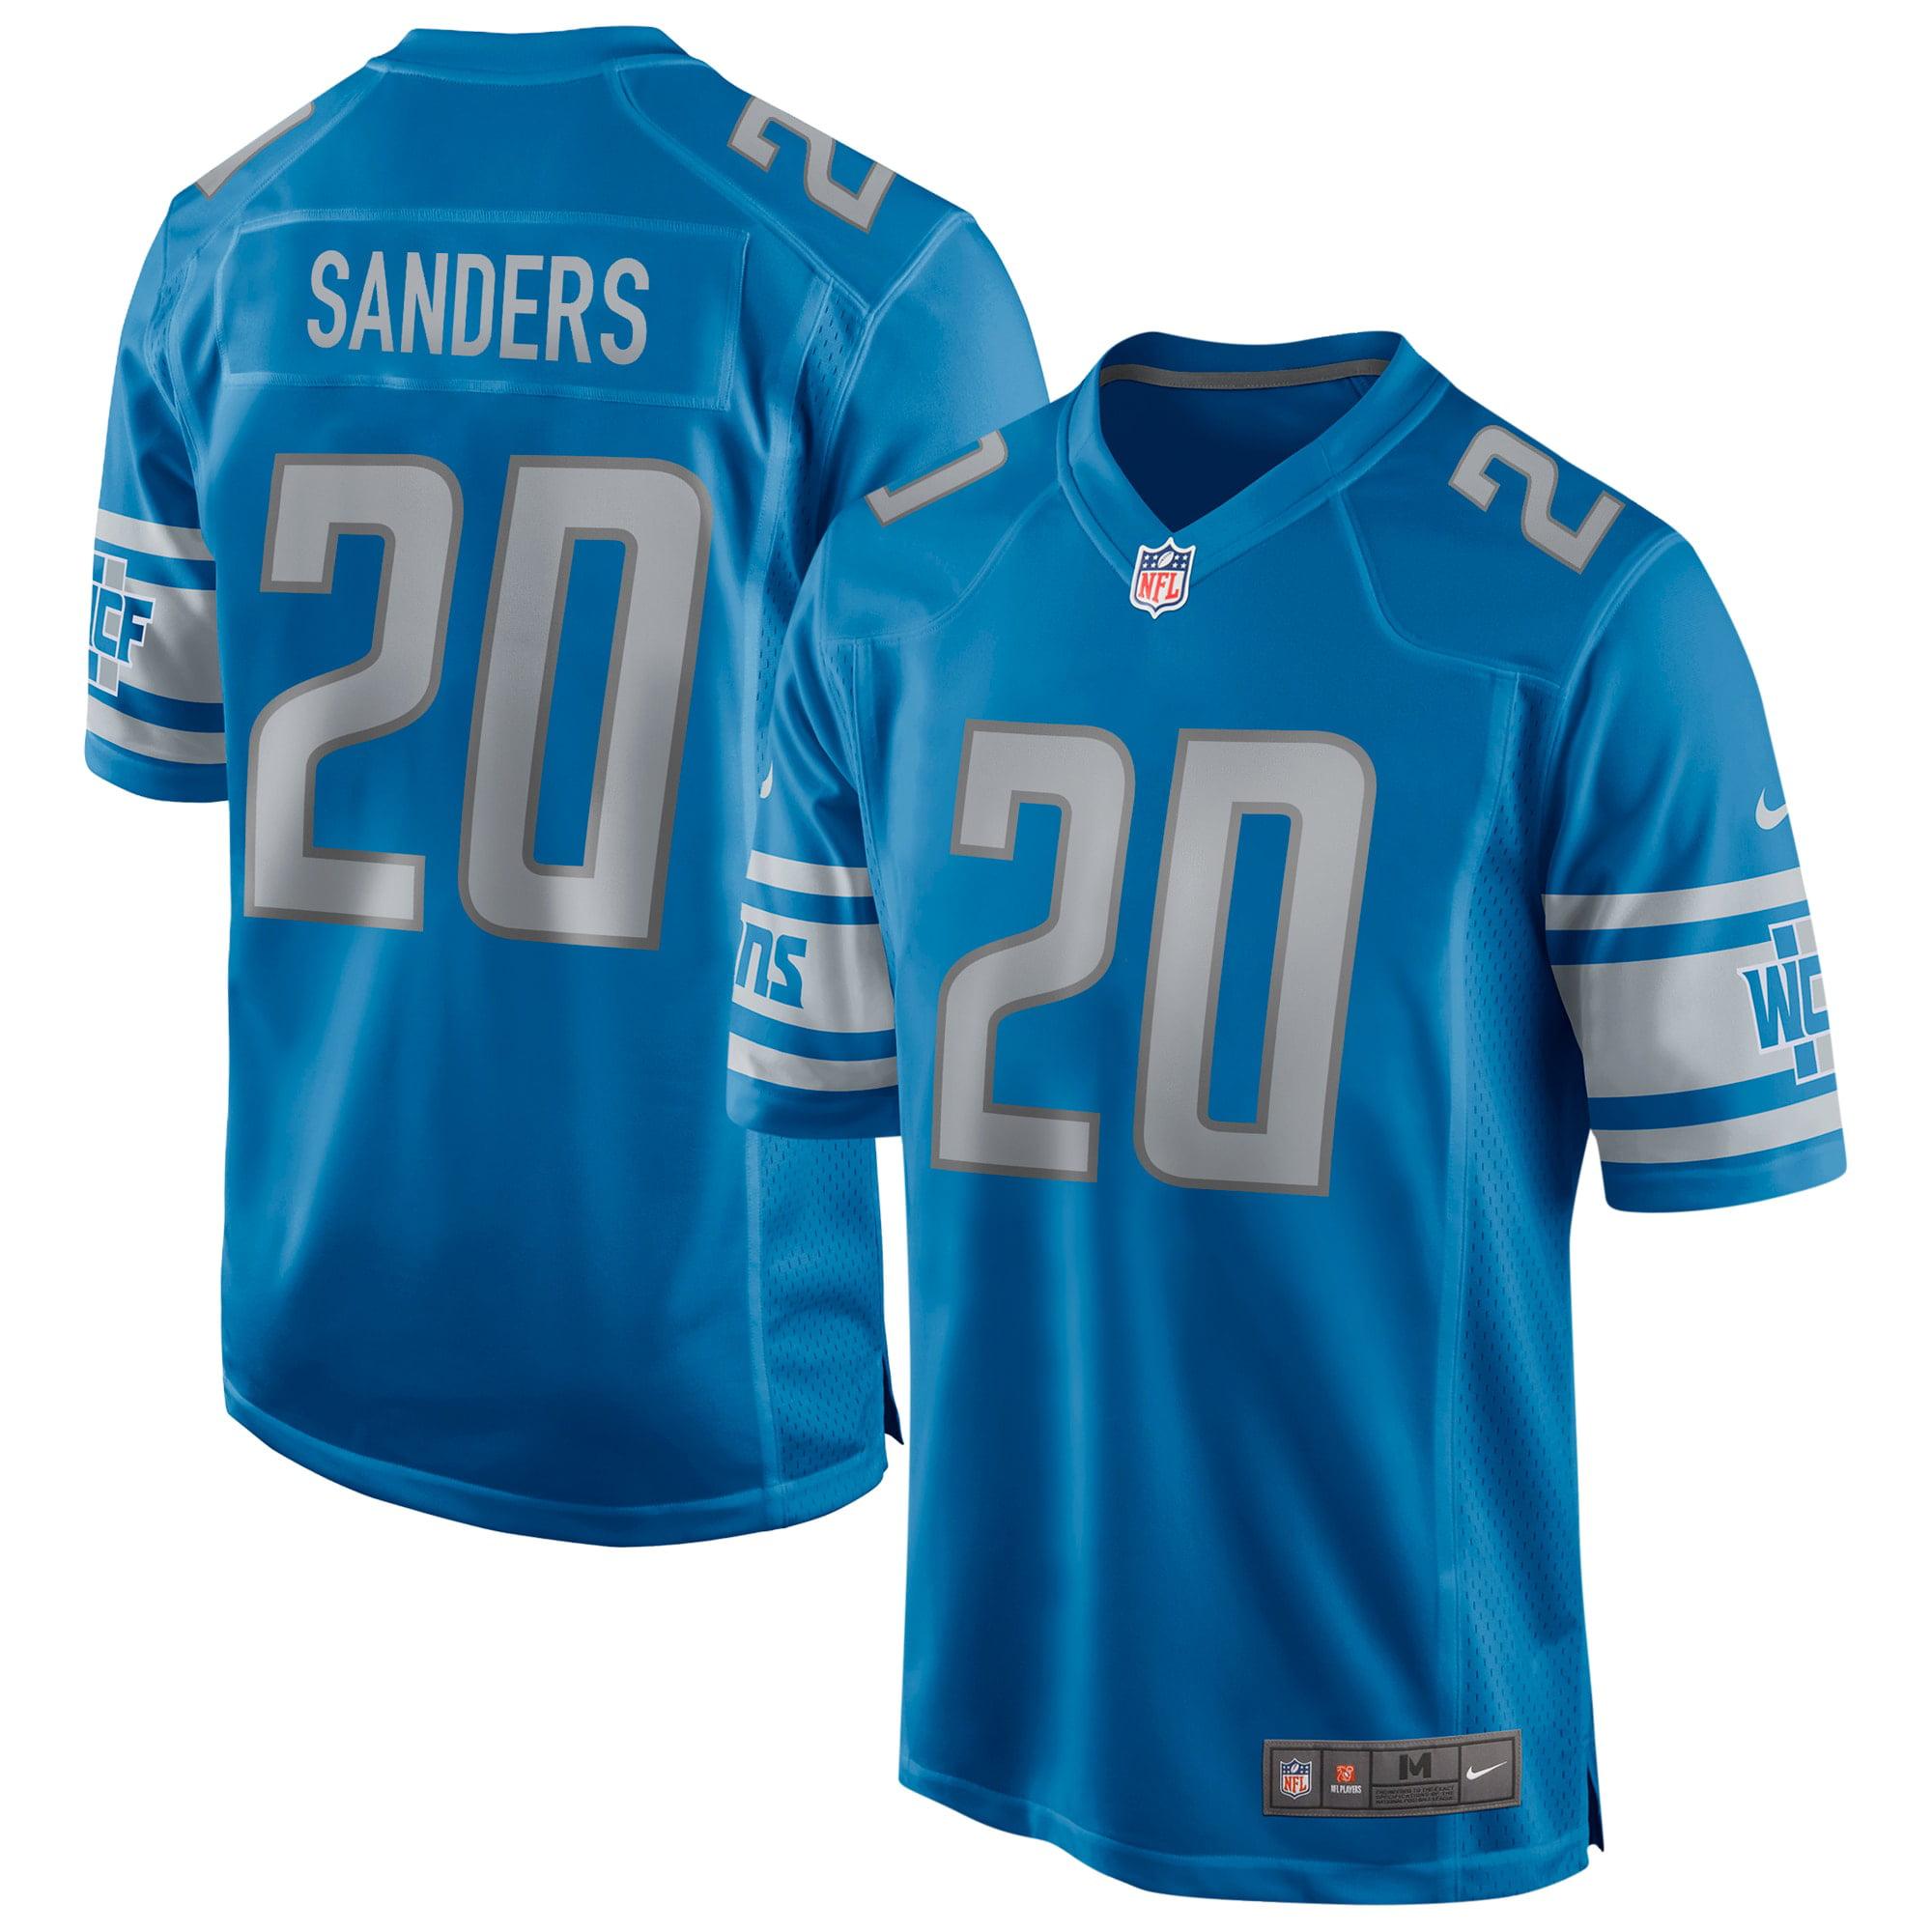 Barry Sanders Detroit Lions Nike Game Retired Player Jersey - Blue - Walmart.com